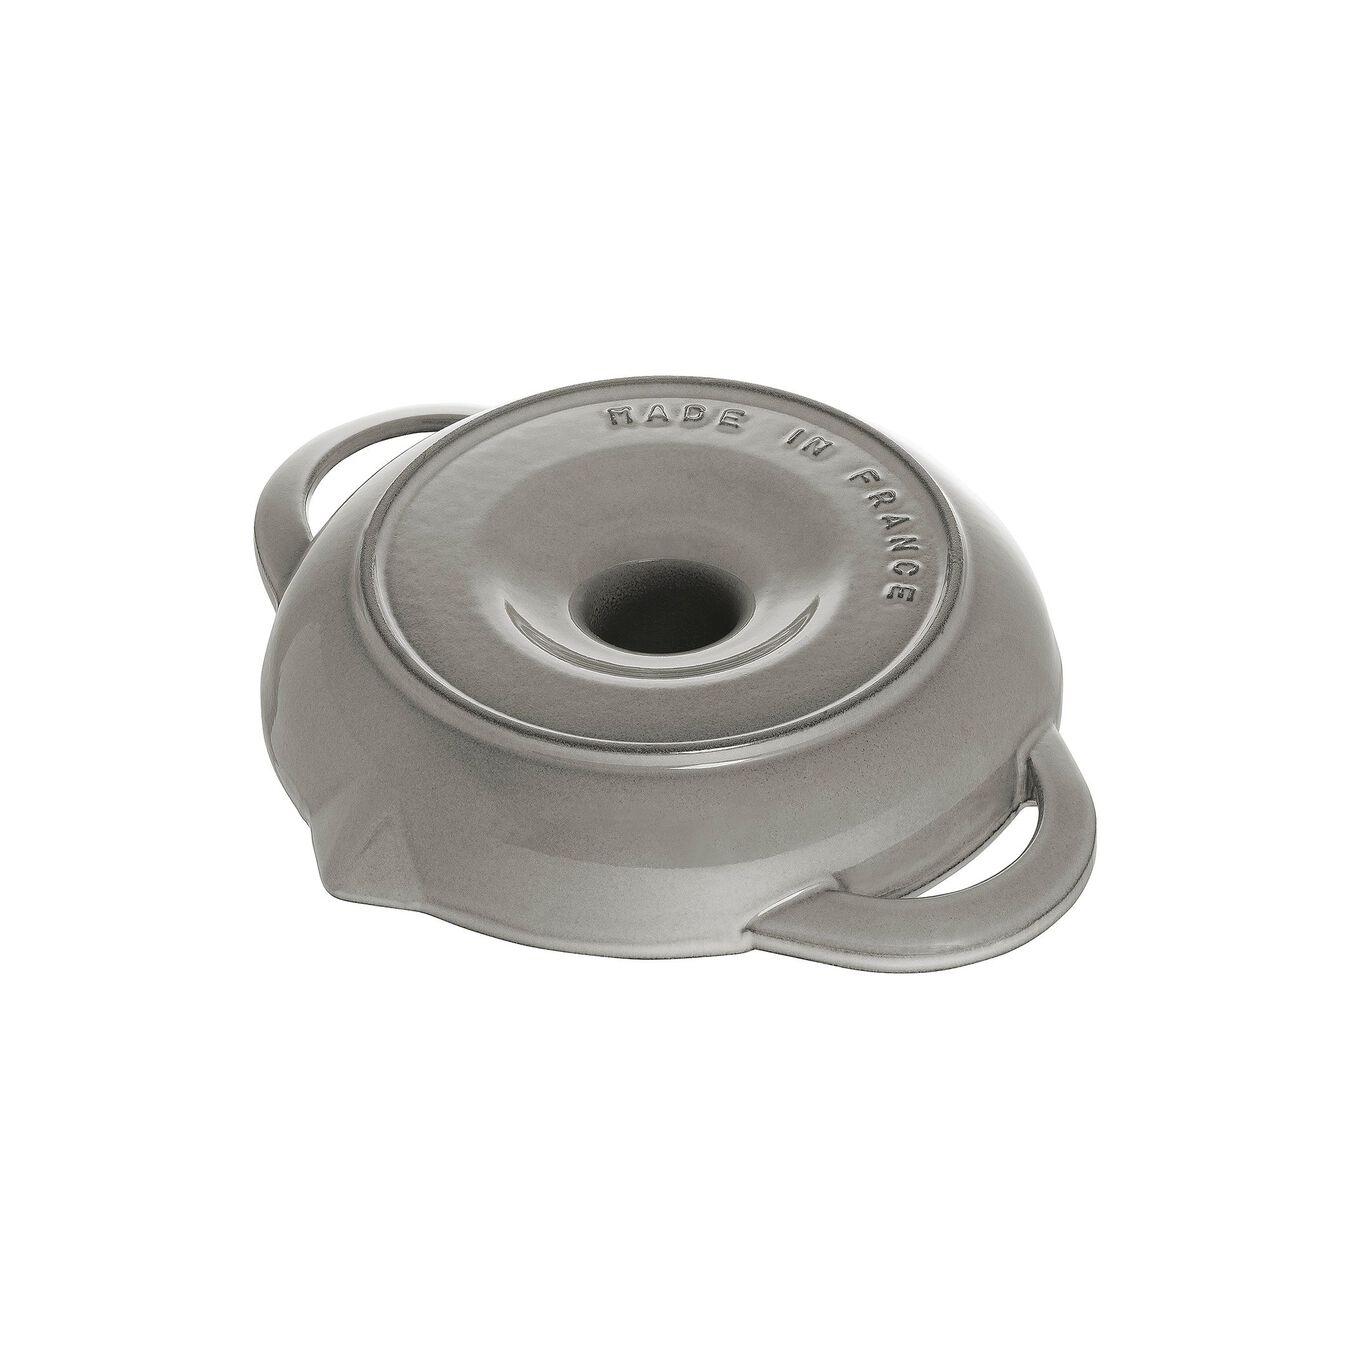 Cuocipollo - 24 cm, grigio grafite,,large 2